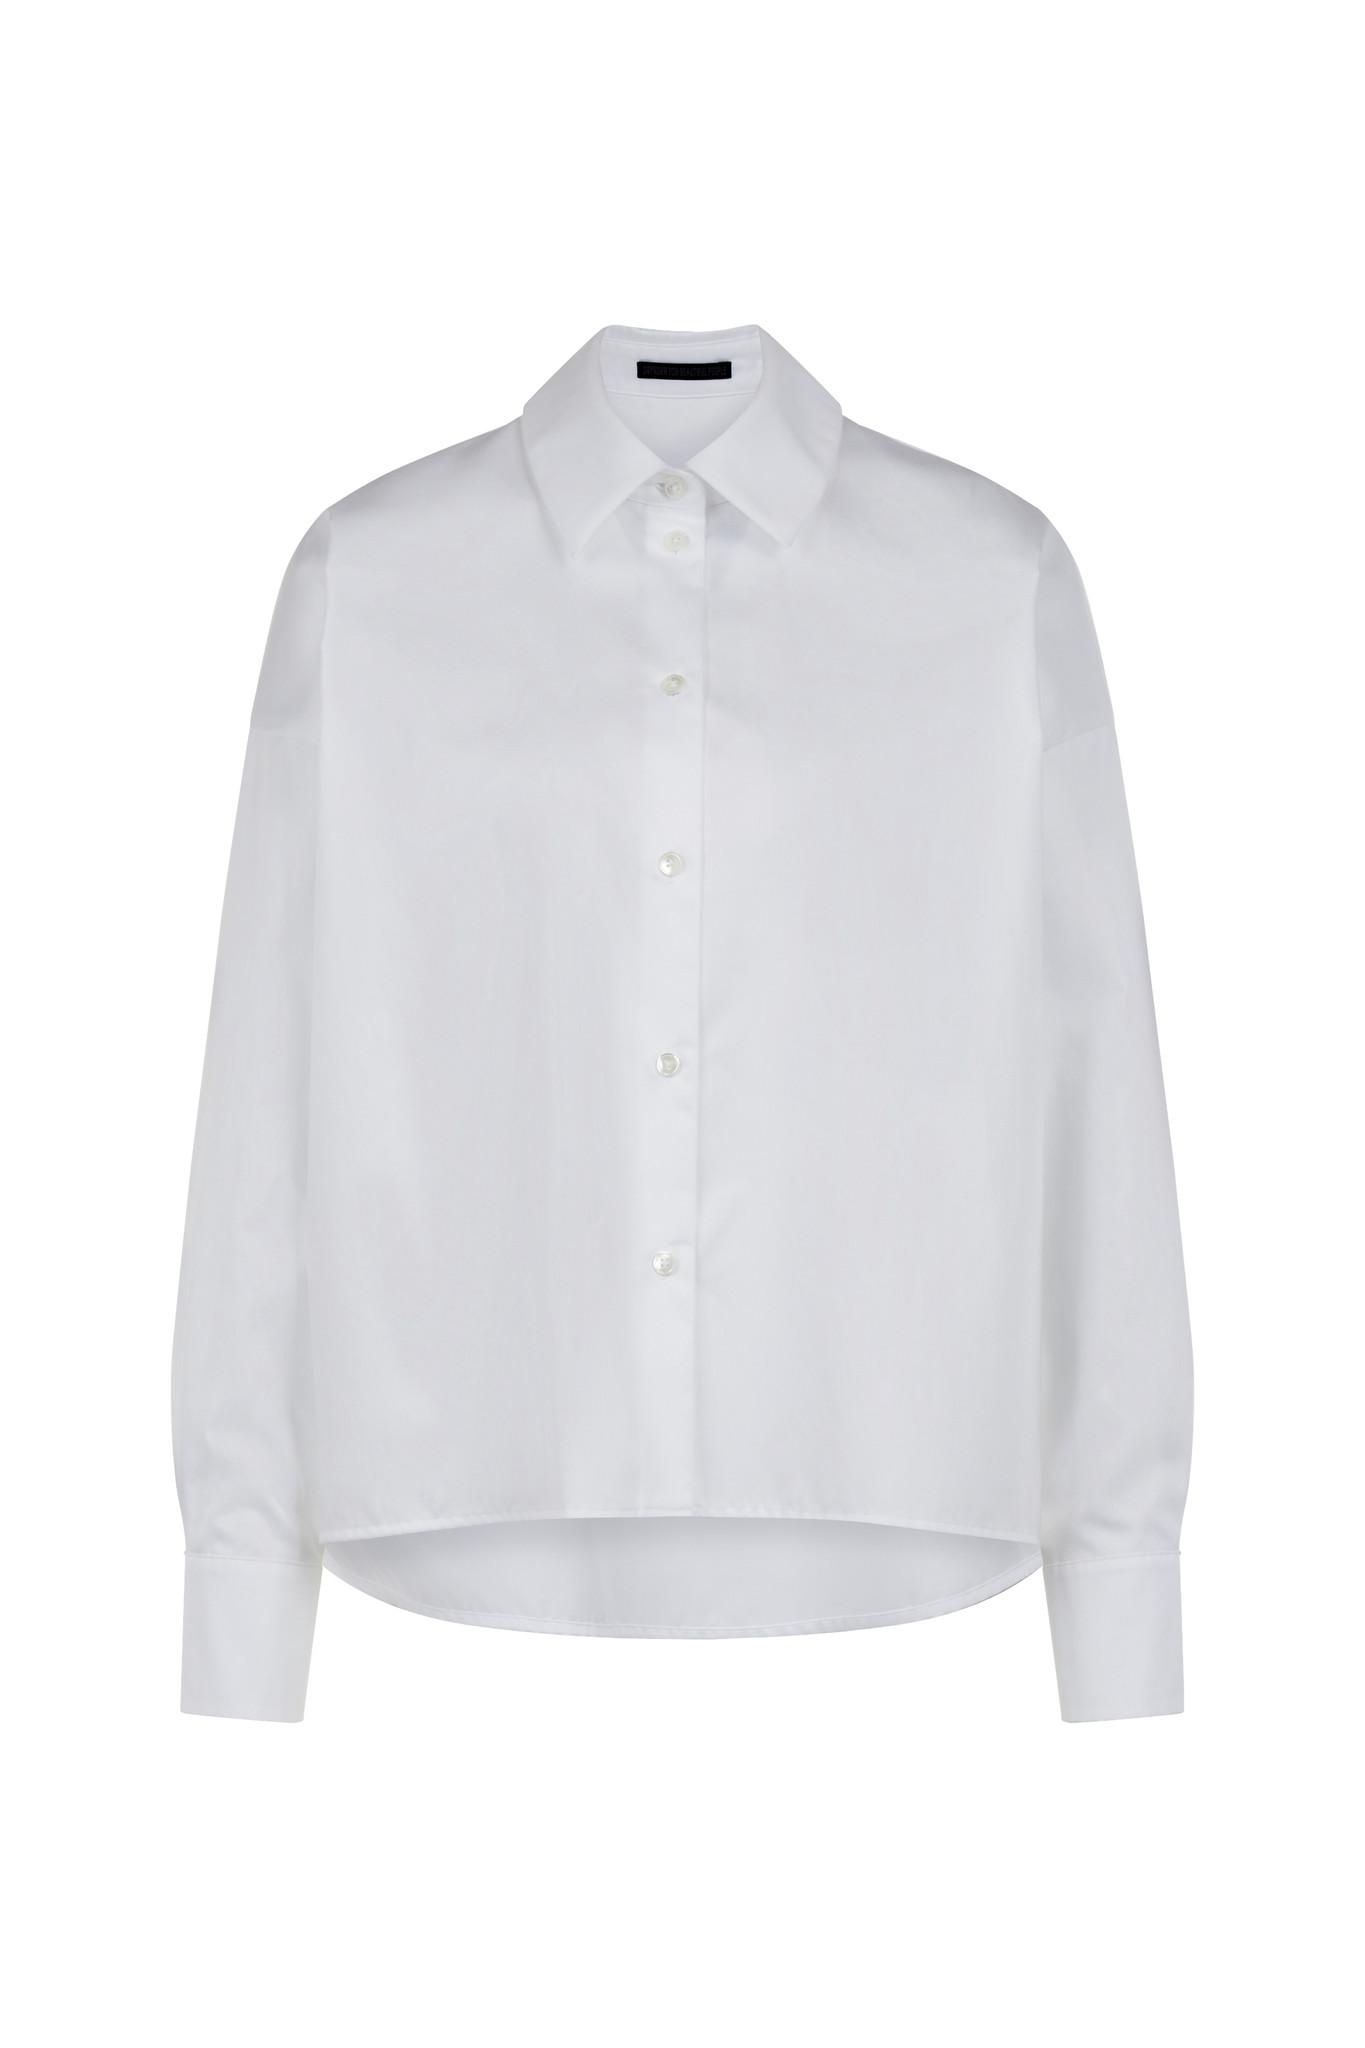 drykorn blouse CLOELIA 124006-1